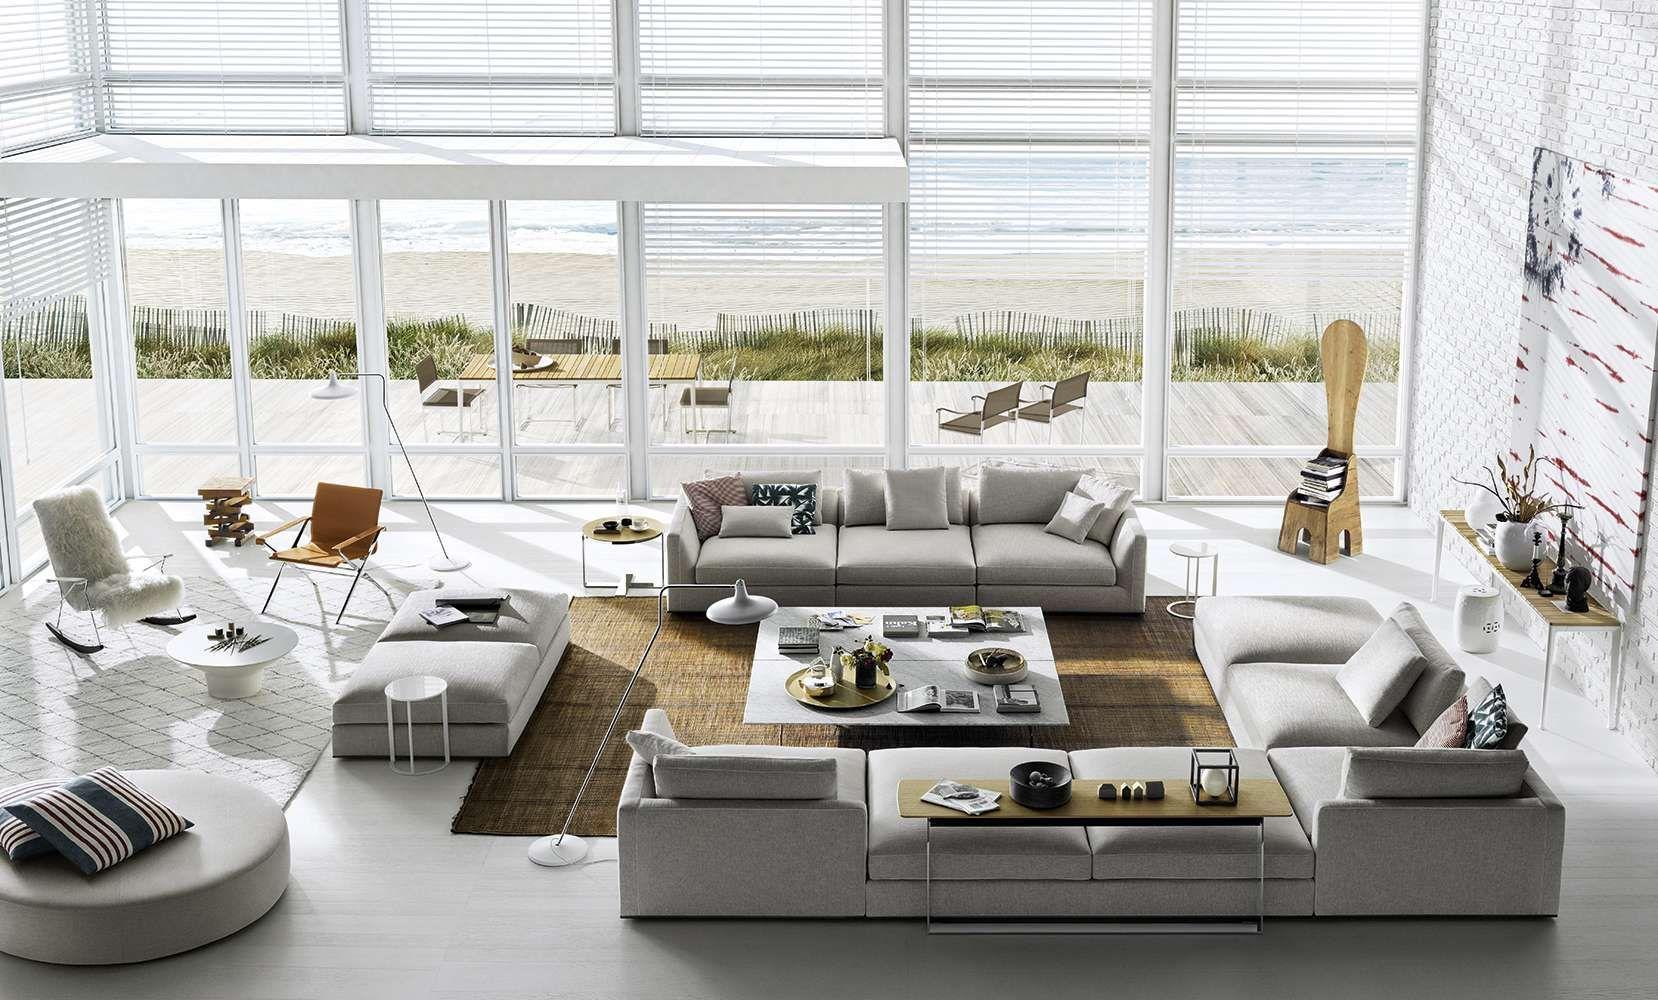 Sofa Richard B B Italia Design Of Antonio Citterio With Images Italian Furniture Modern Interior Design Furniture Italian Furniture Brands